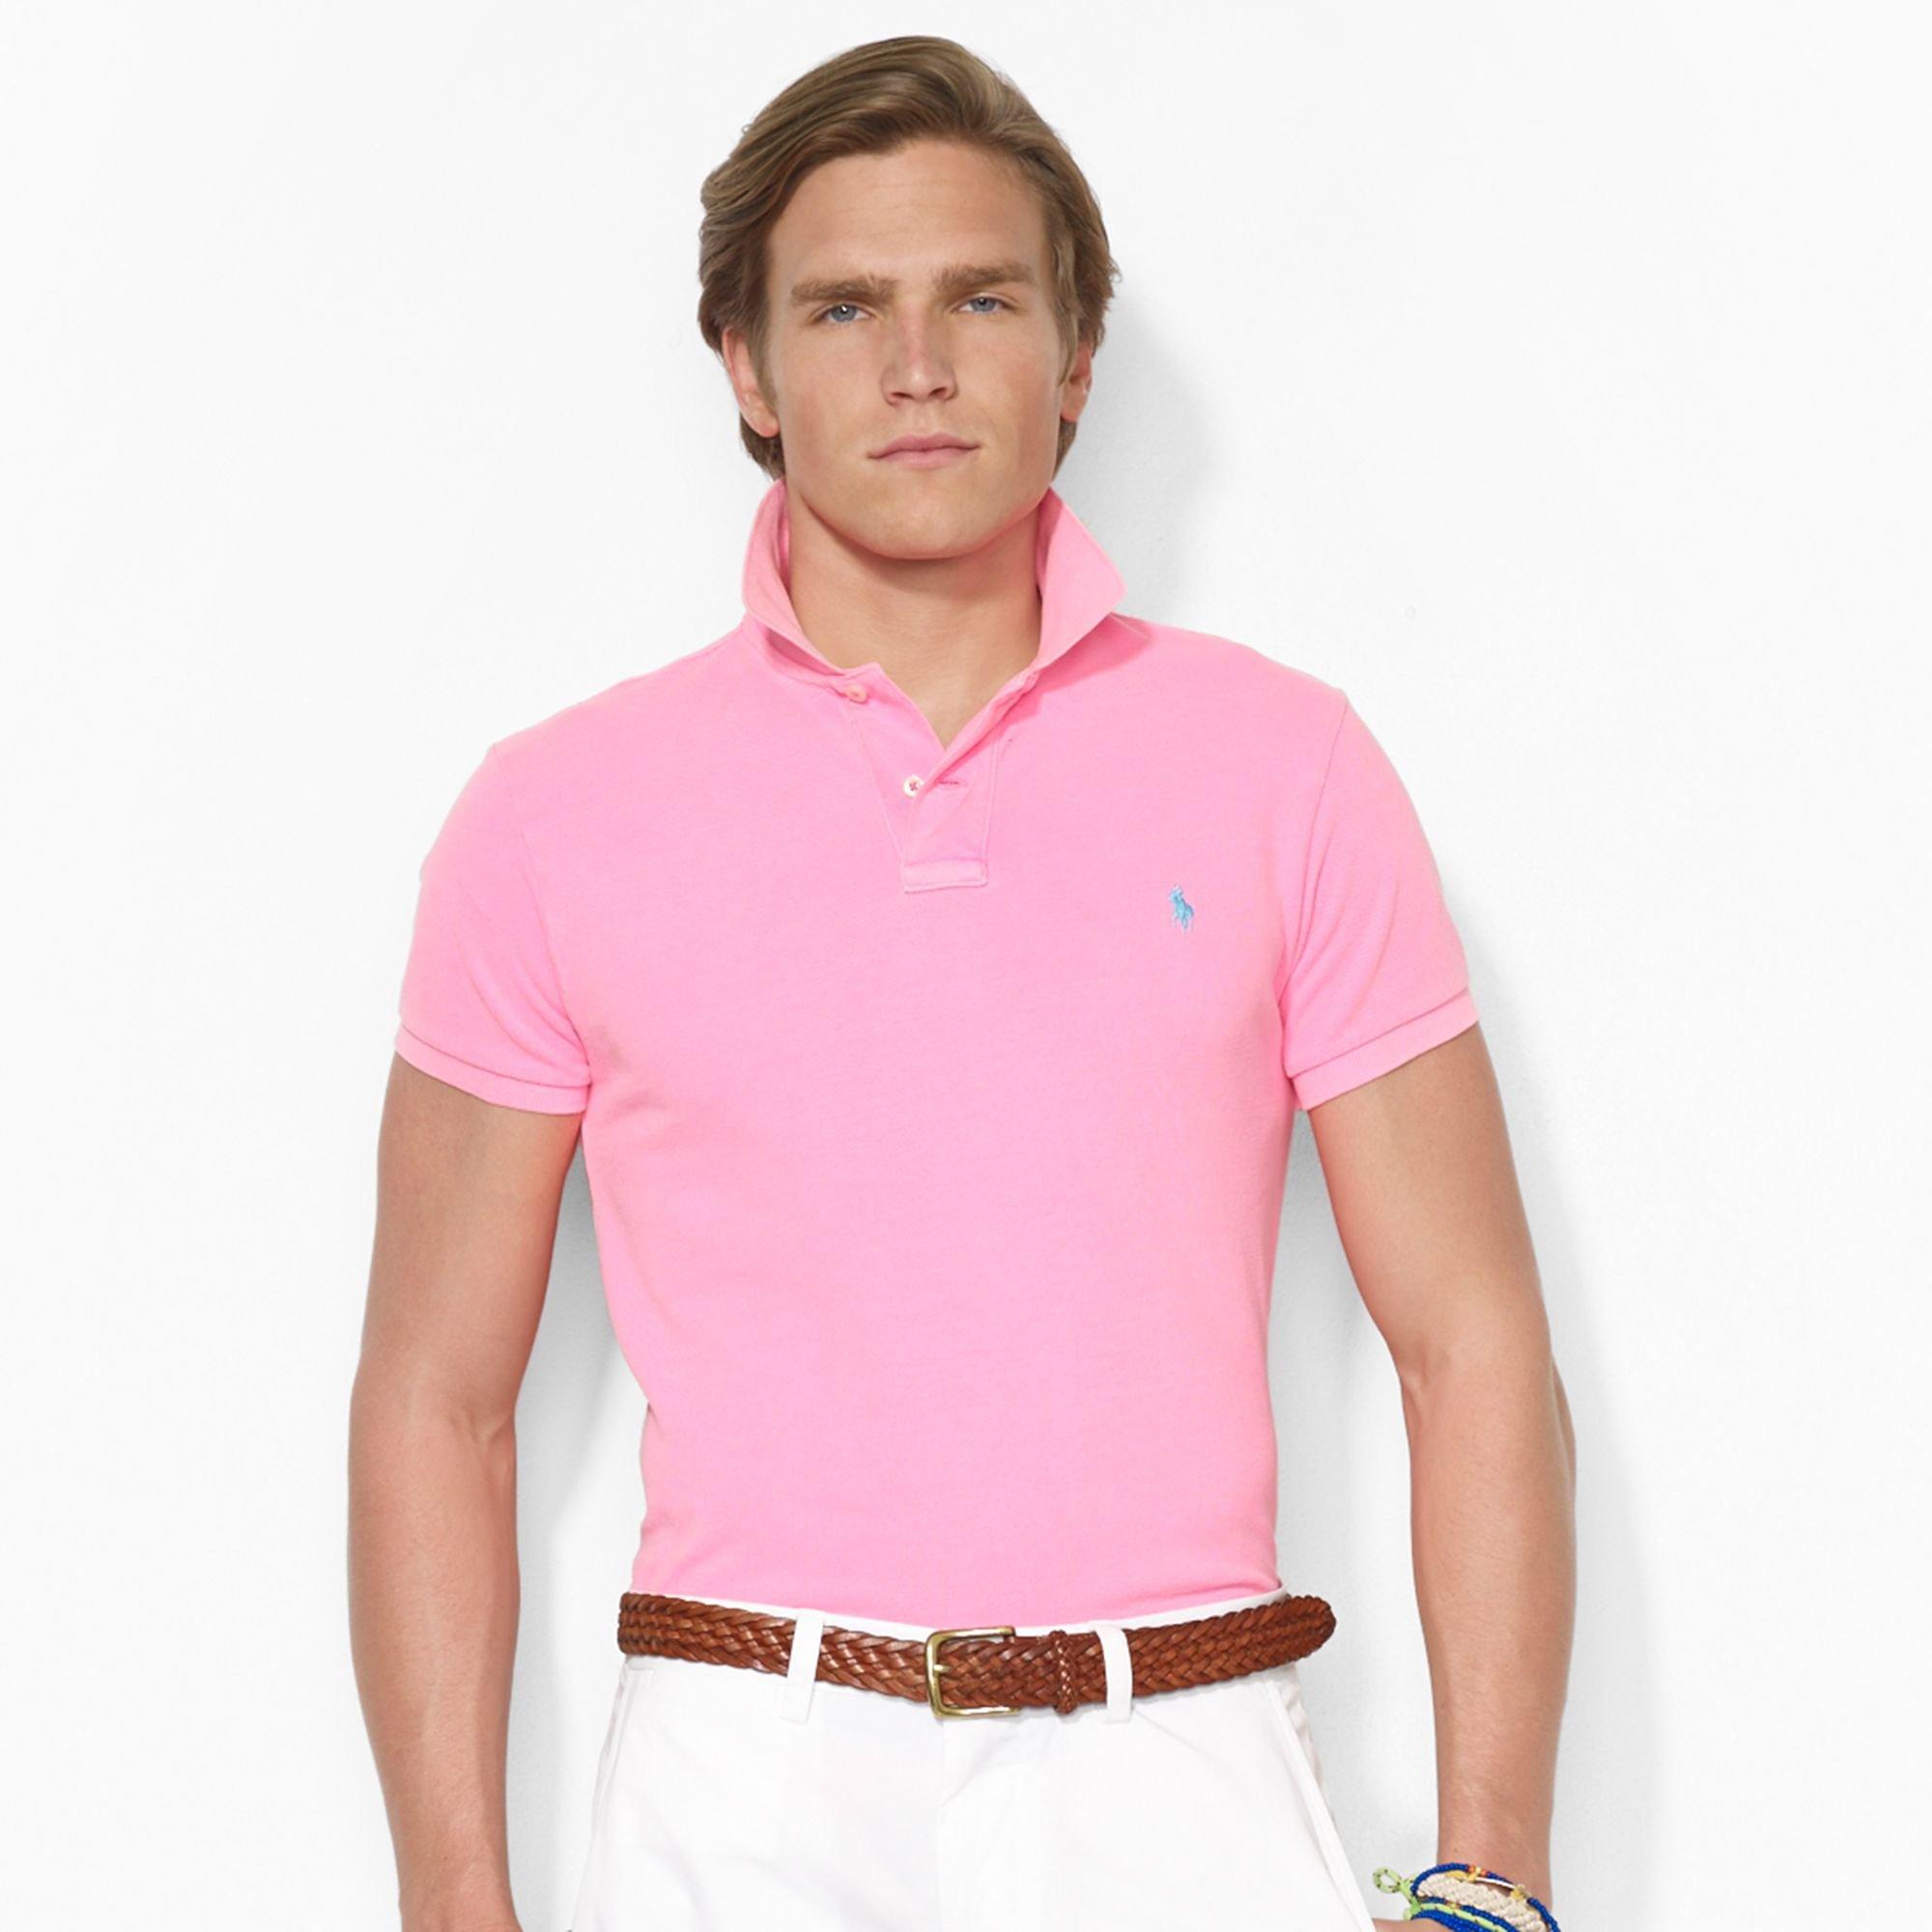 Polo Ralph Lauren Custom Neon Mesh Polo Shirt In Pink For